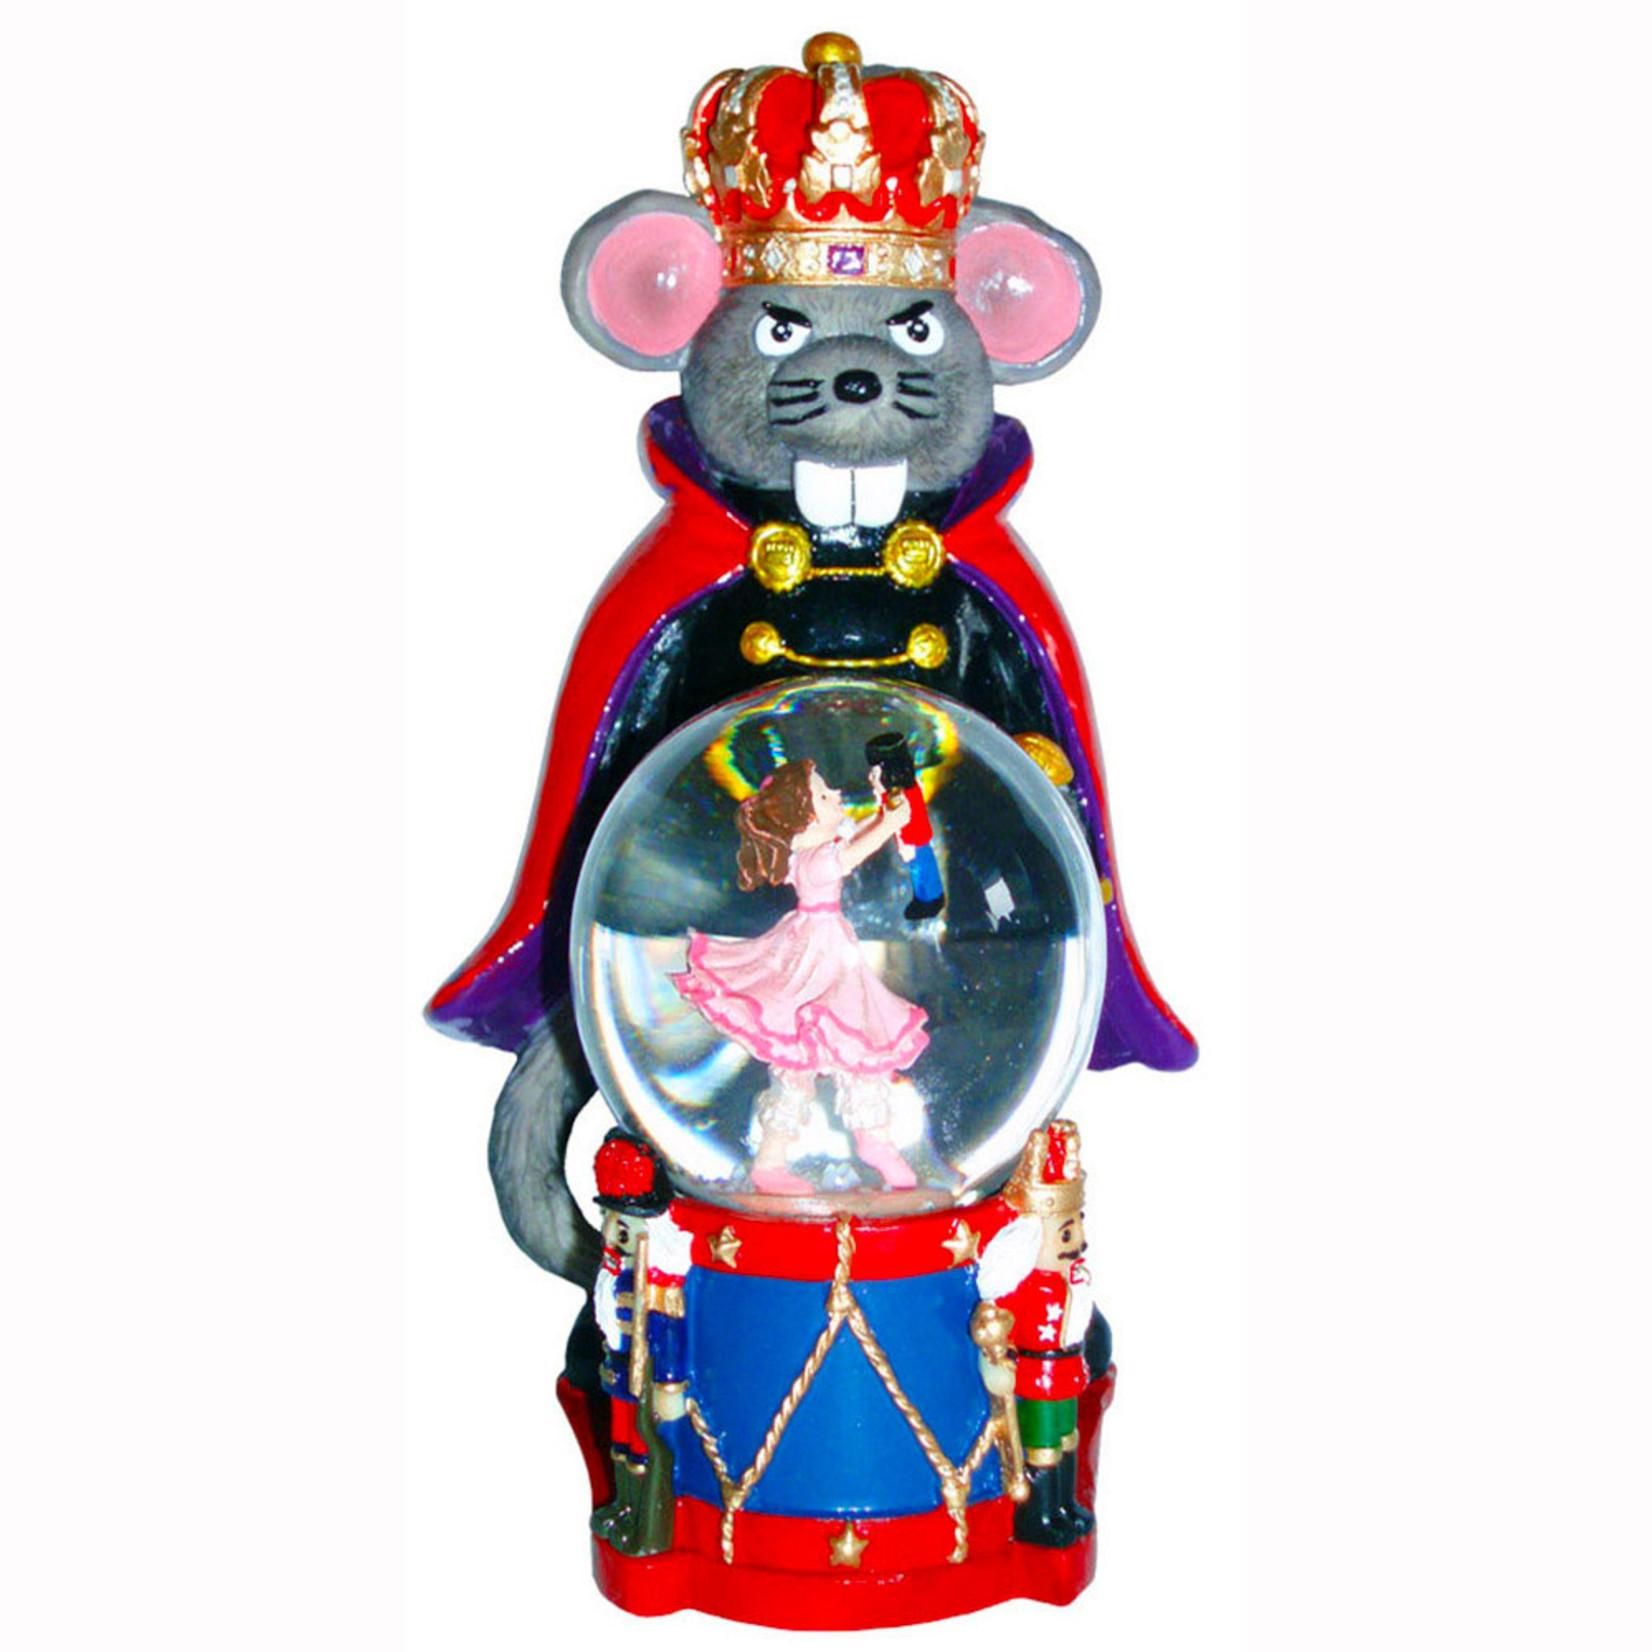 Nutcracker Ballet Gifts Mouse King Figurine With Clara Mini Snow Globe